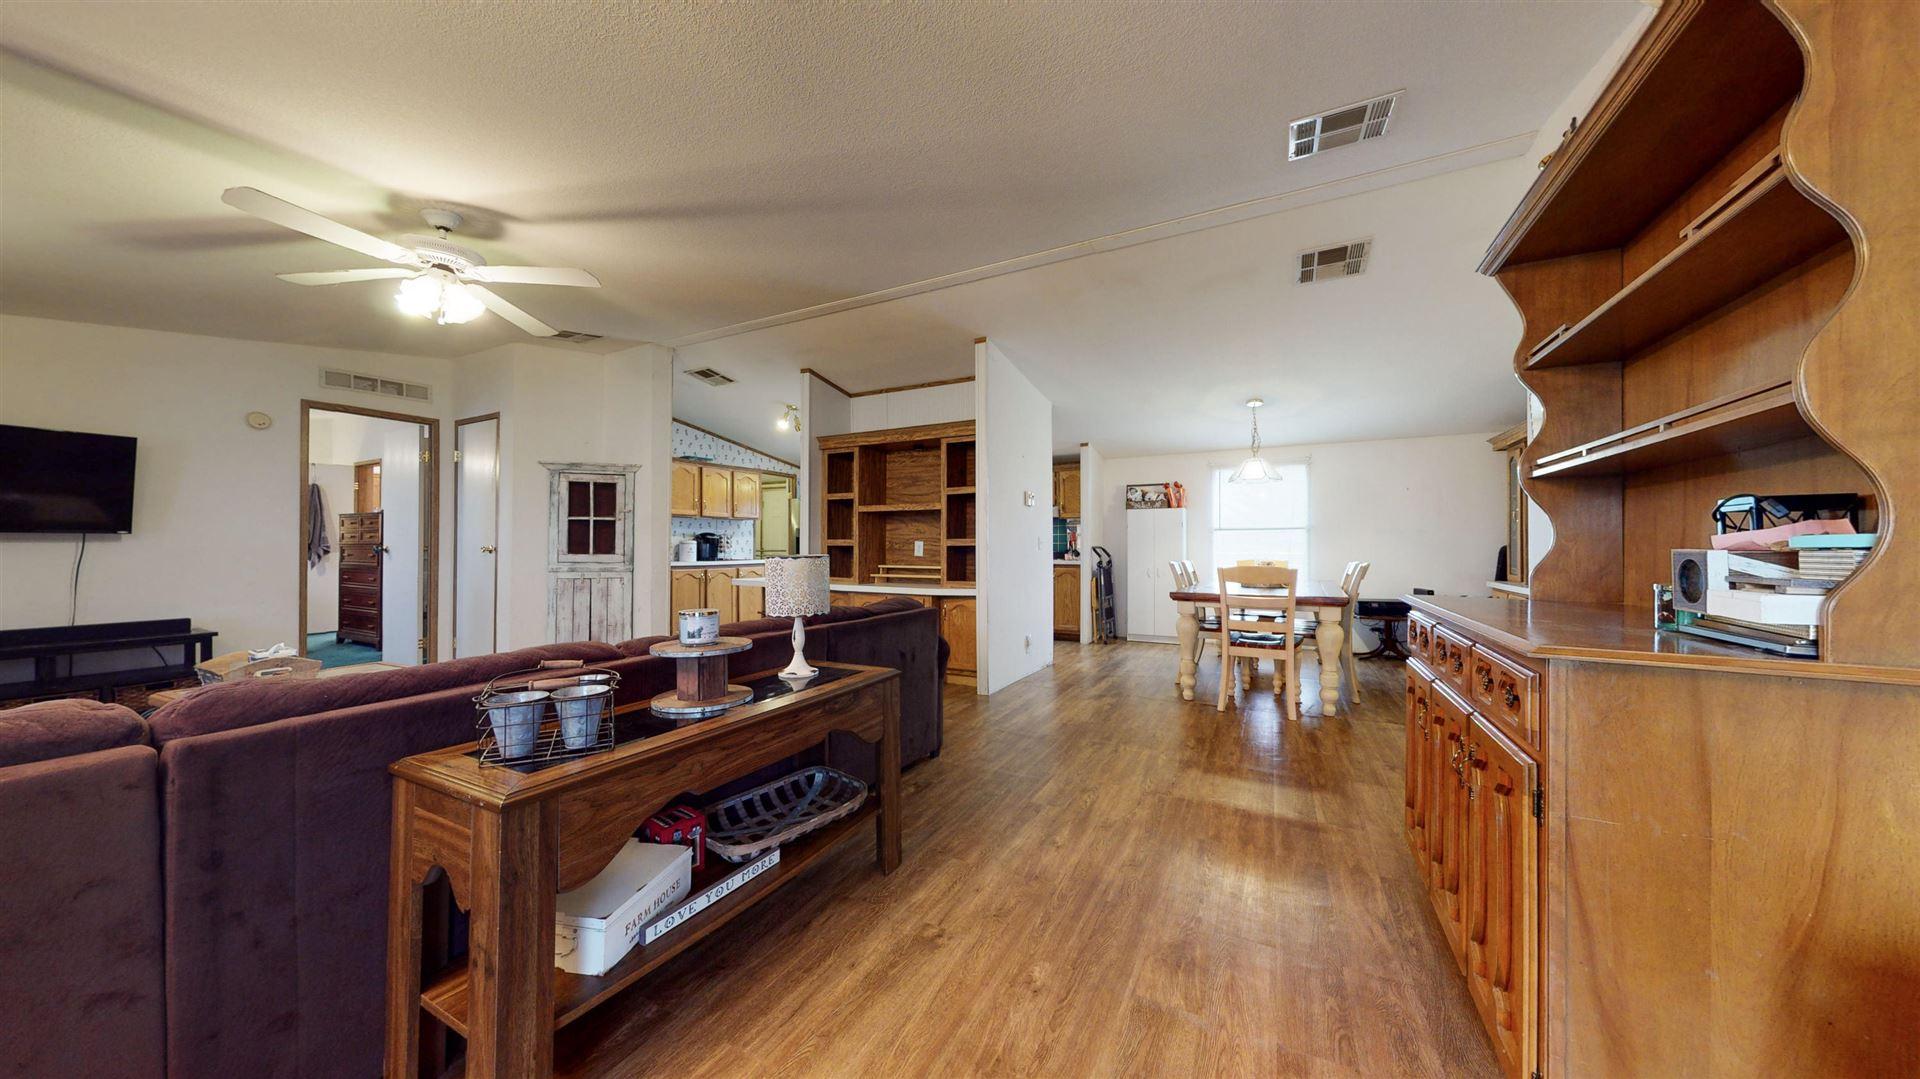 16 COTTONWOOD Lane, Los Lunas, NM 87031 - MLS#: 967464